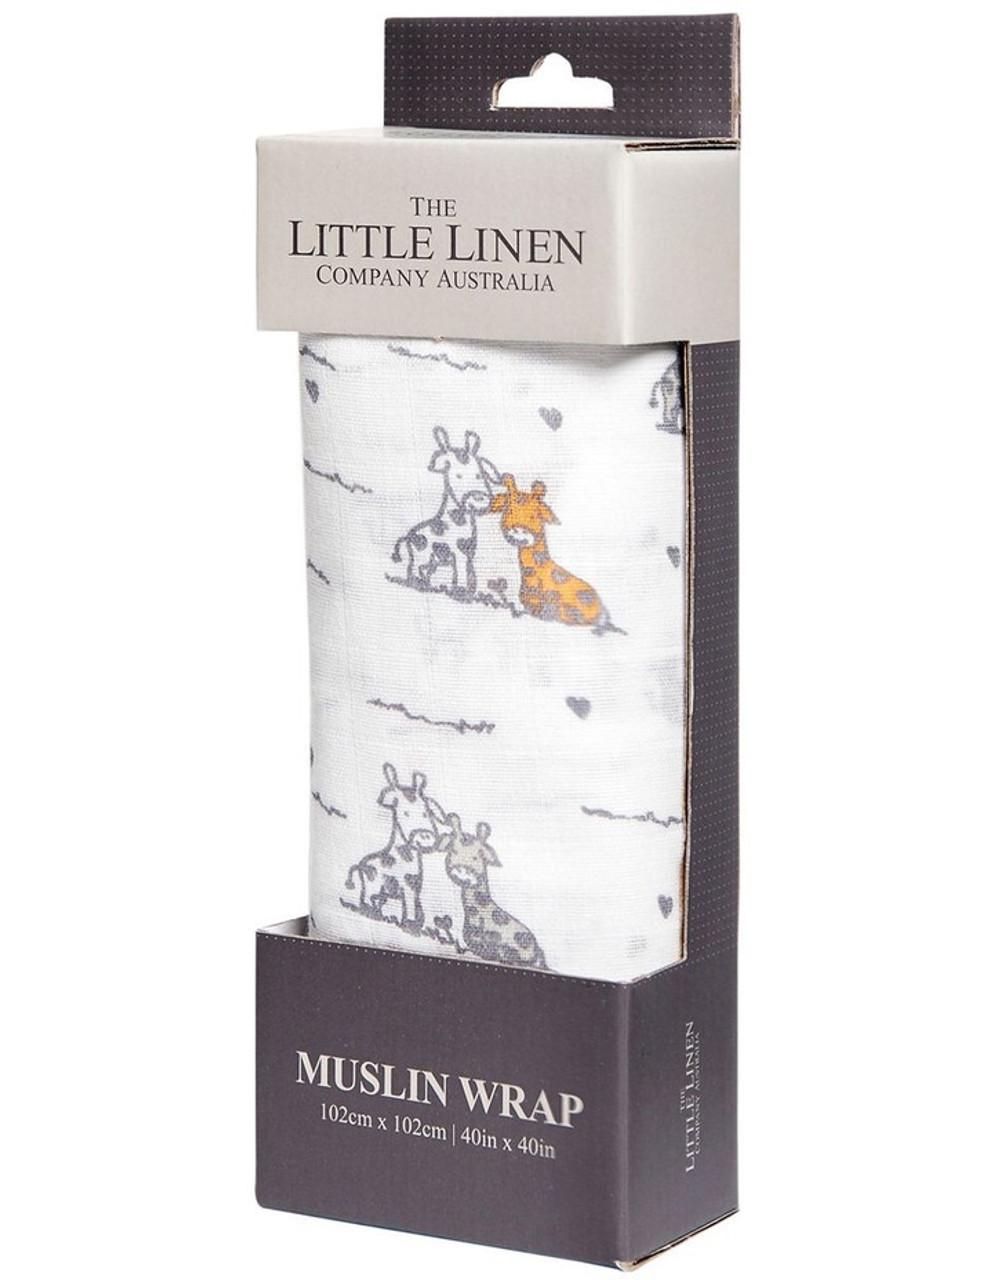 The Little Linen Muslin Wrap 102x102cm 1pk | Baby Barn Discounts The Little linen muslin cotton swaddle wrap size 102 x 102 cm.